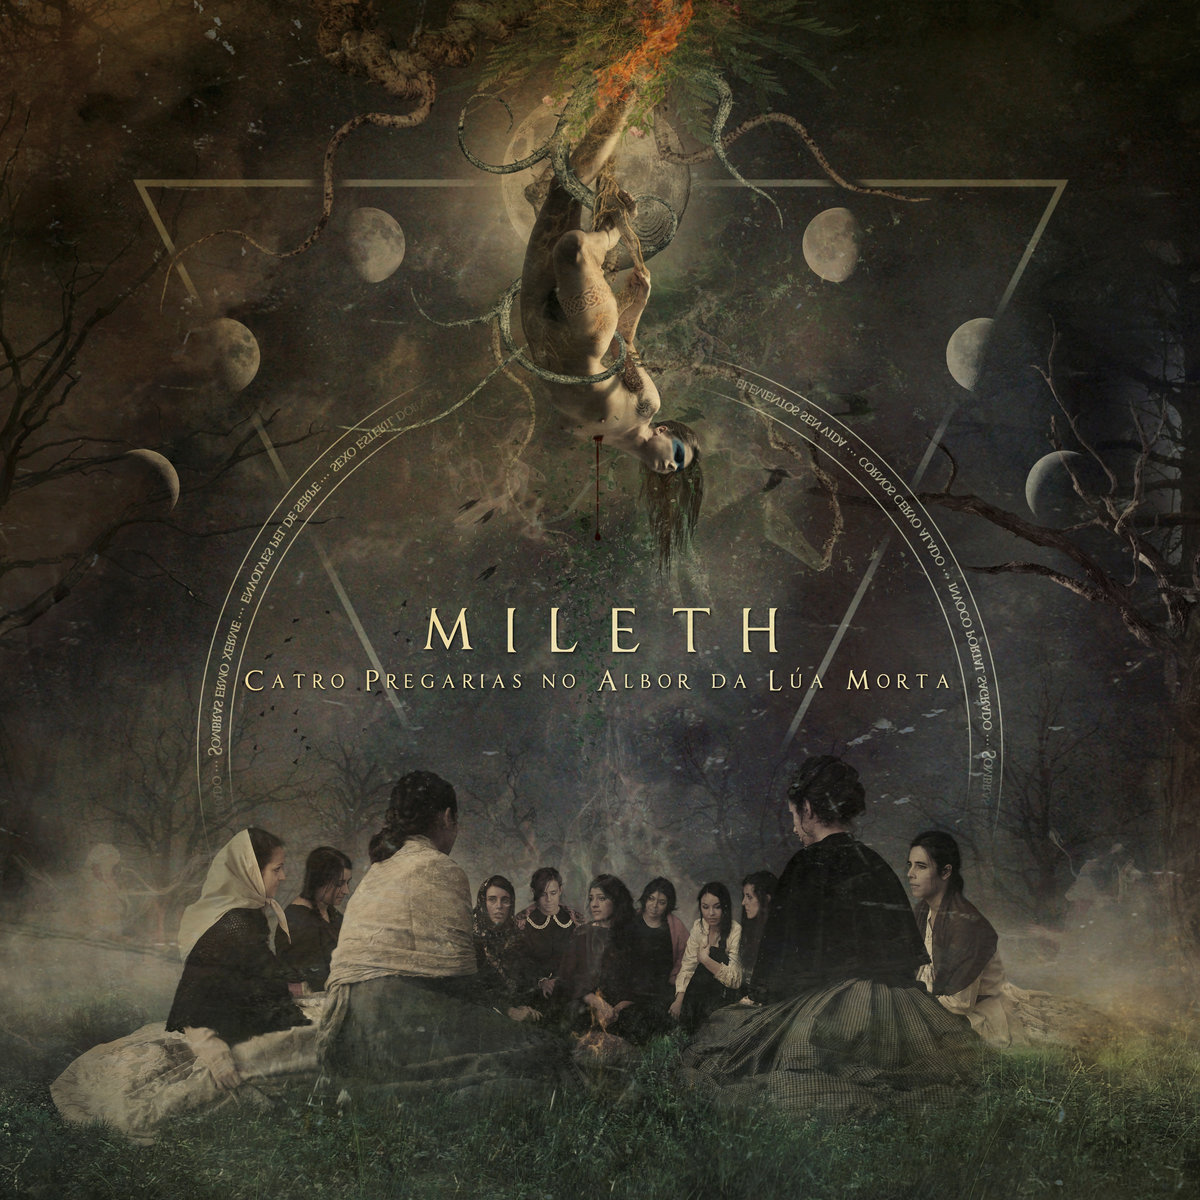 portada del album Catro Pregarias no Albor da Lúa Morta